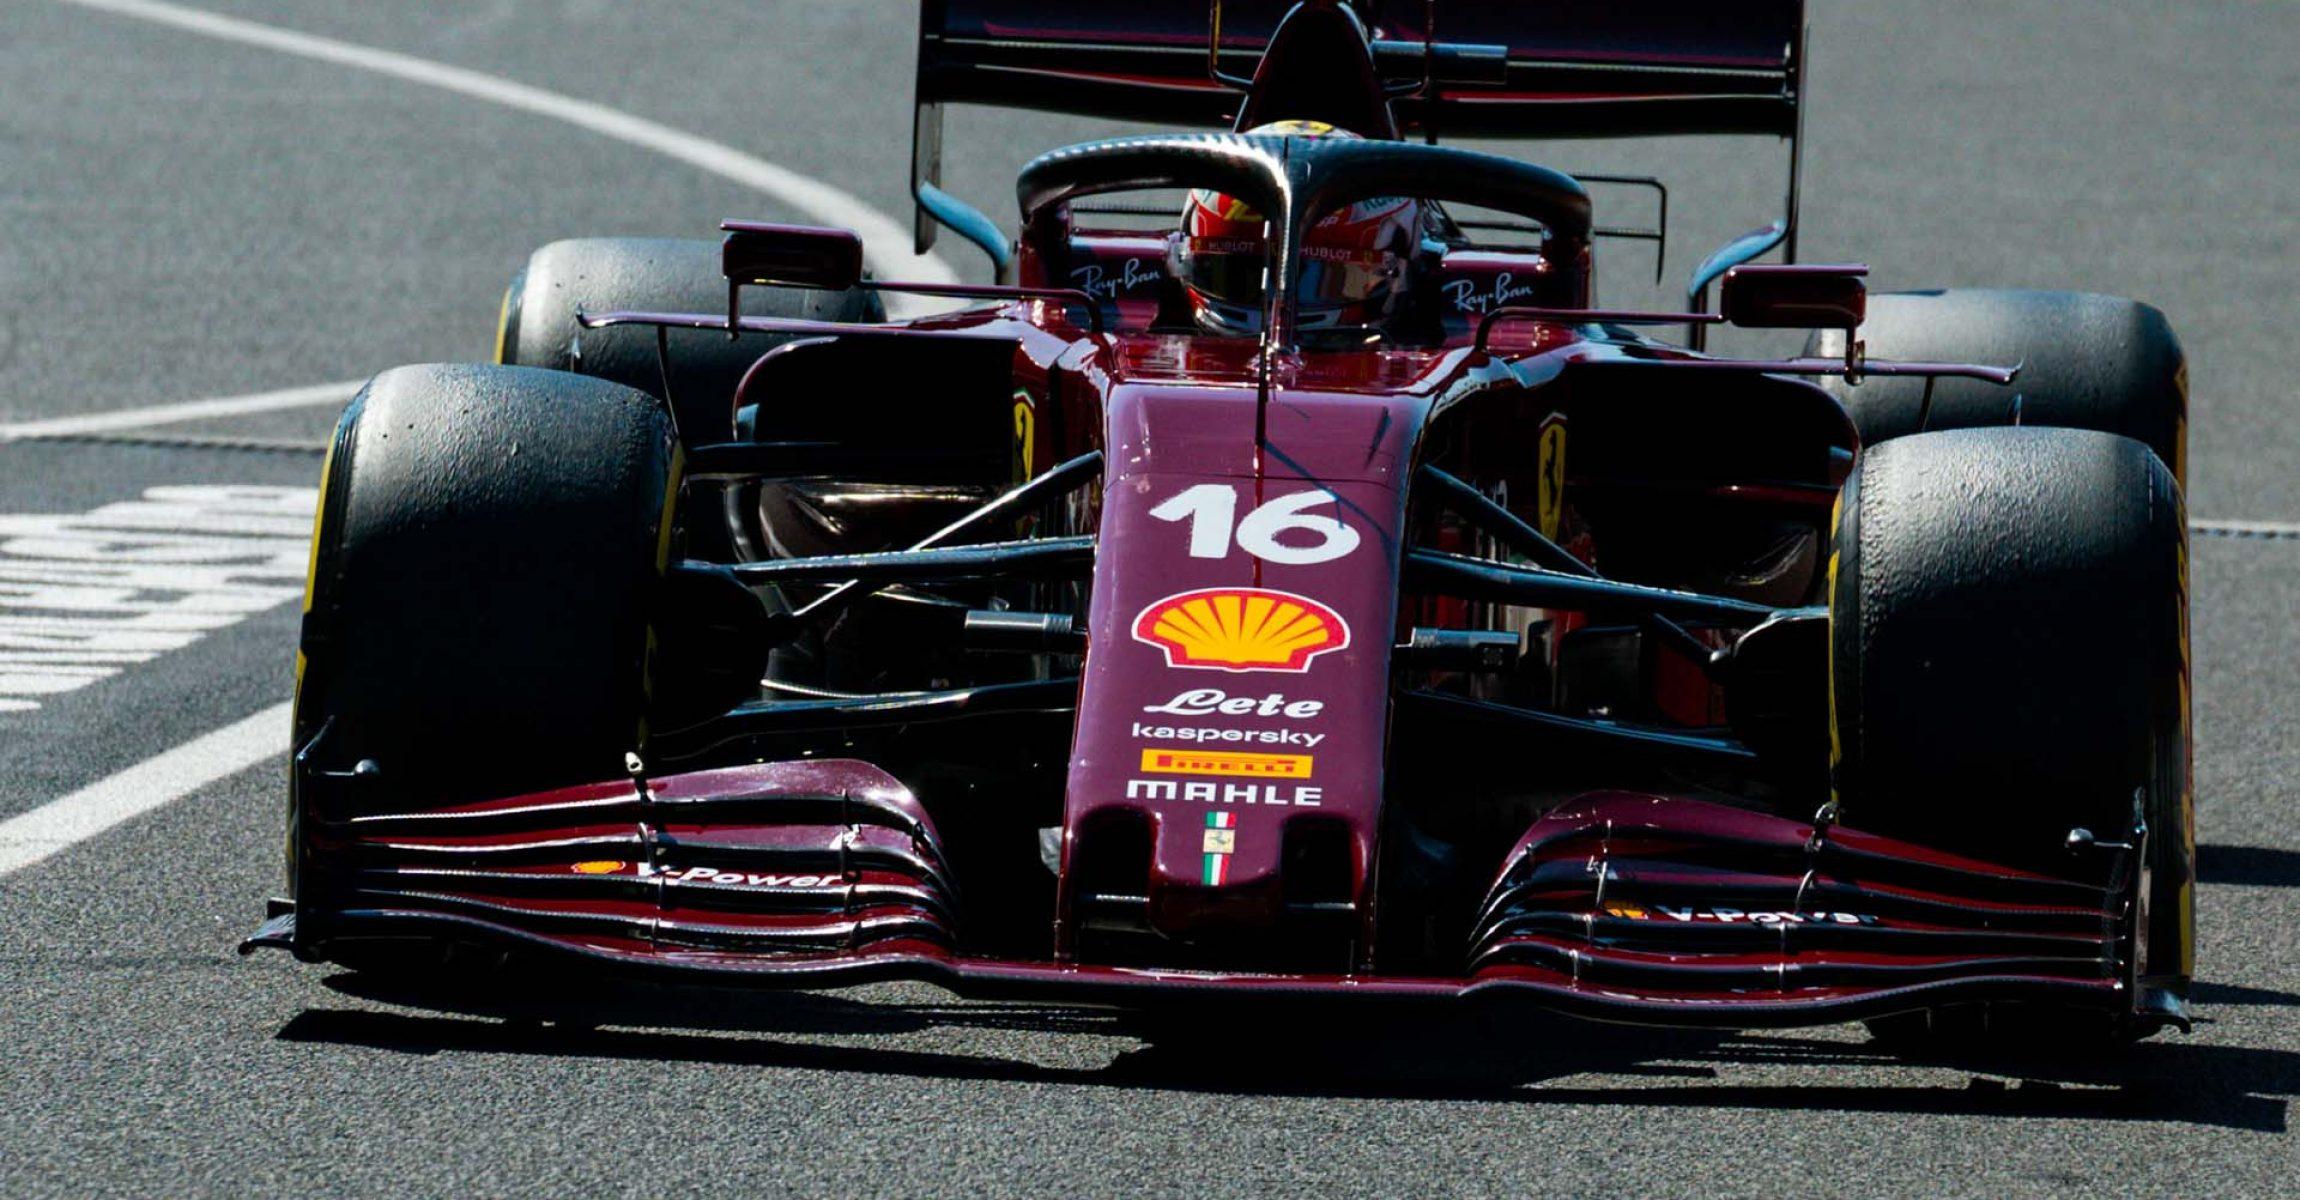 GP TOSCANA FERRARI 1000 F1/2020 -  SABATO 12/09/2020   credit: @Scuderia Ferrari Press Office Charles Leclerc